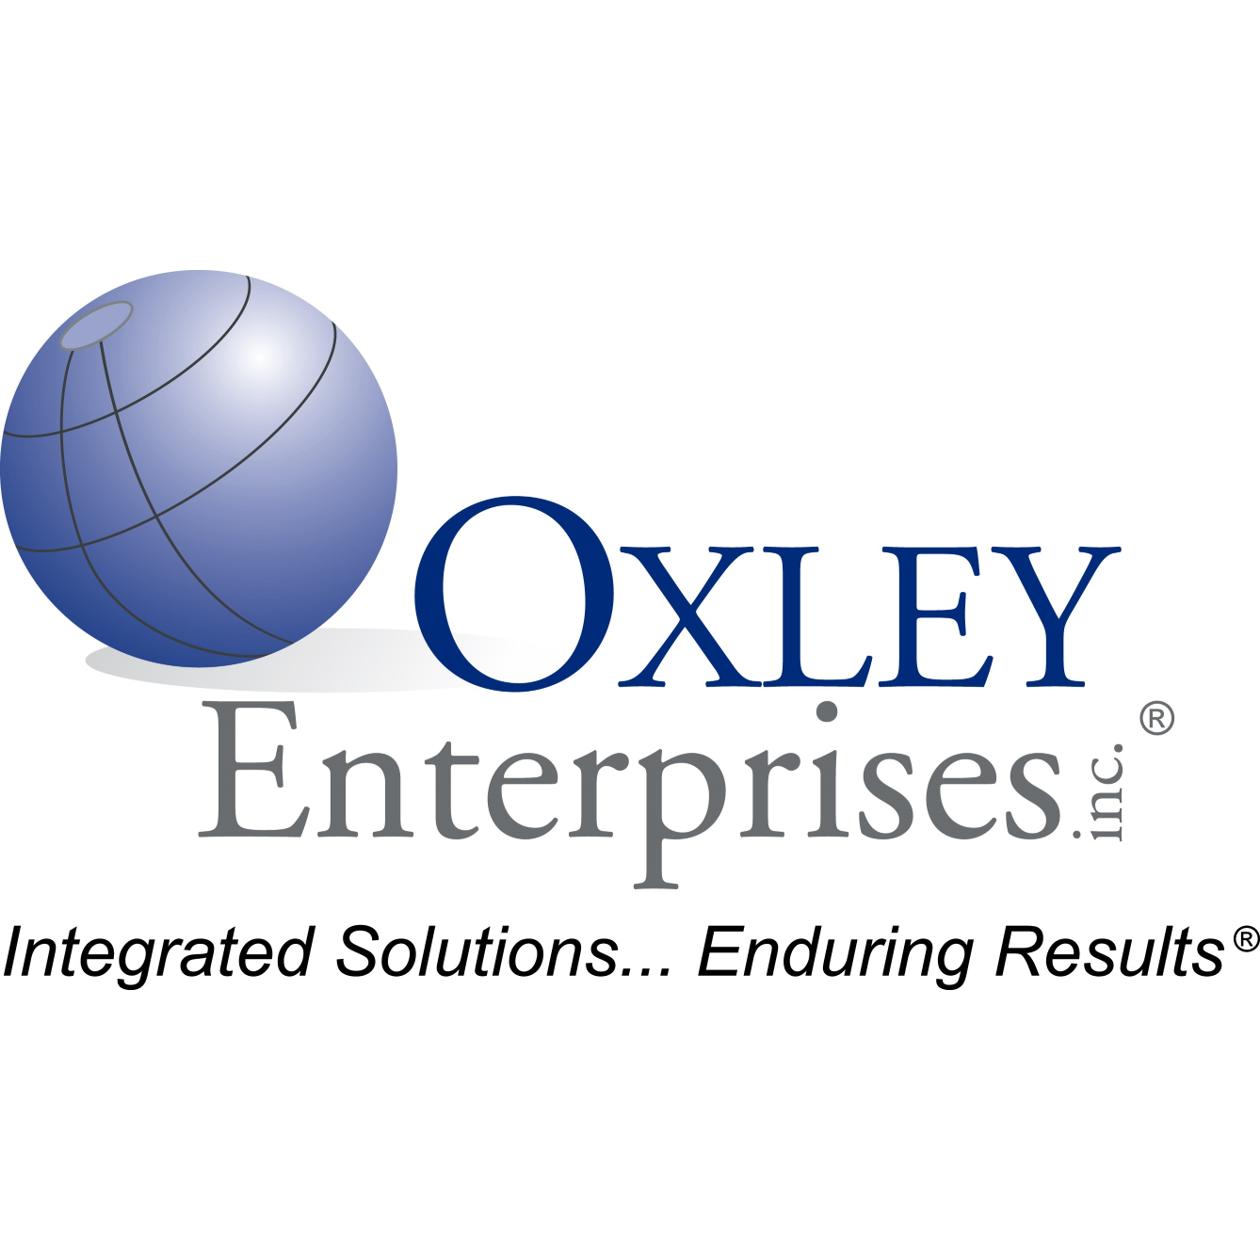 Oxley Enterprises, Inc.